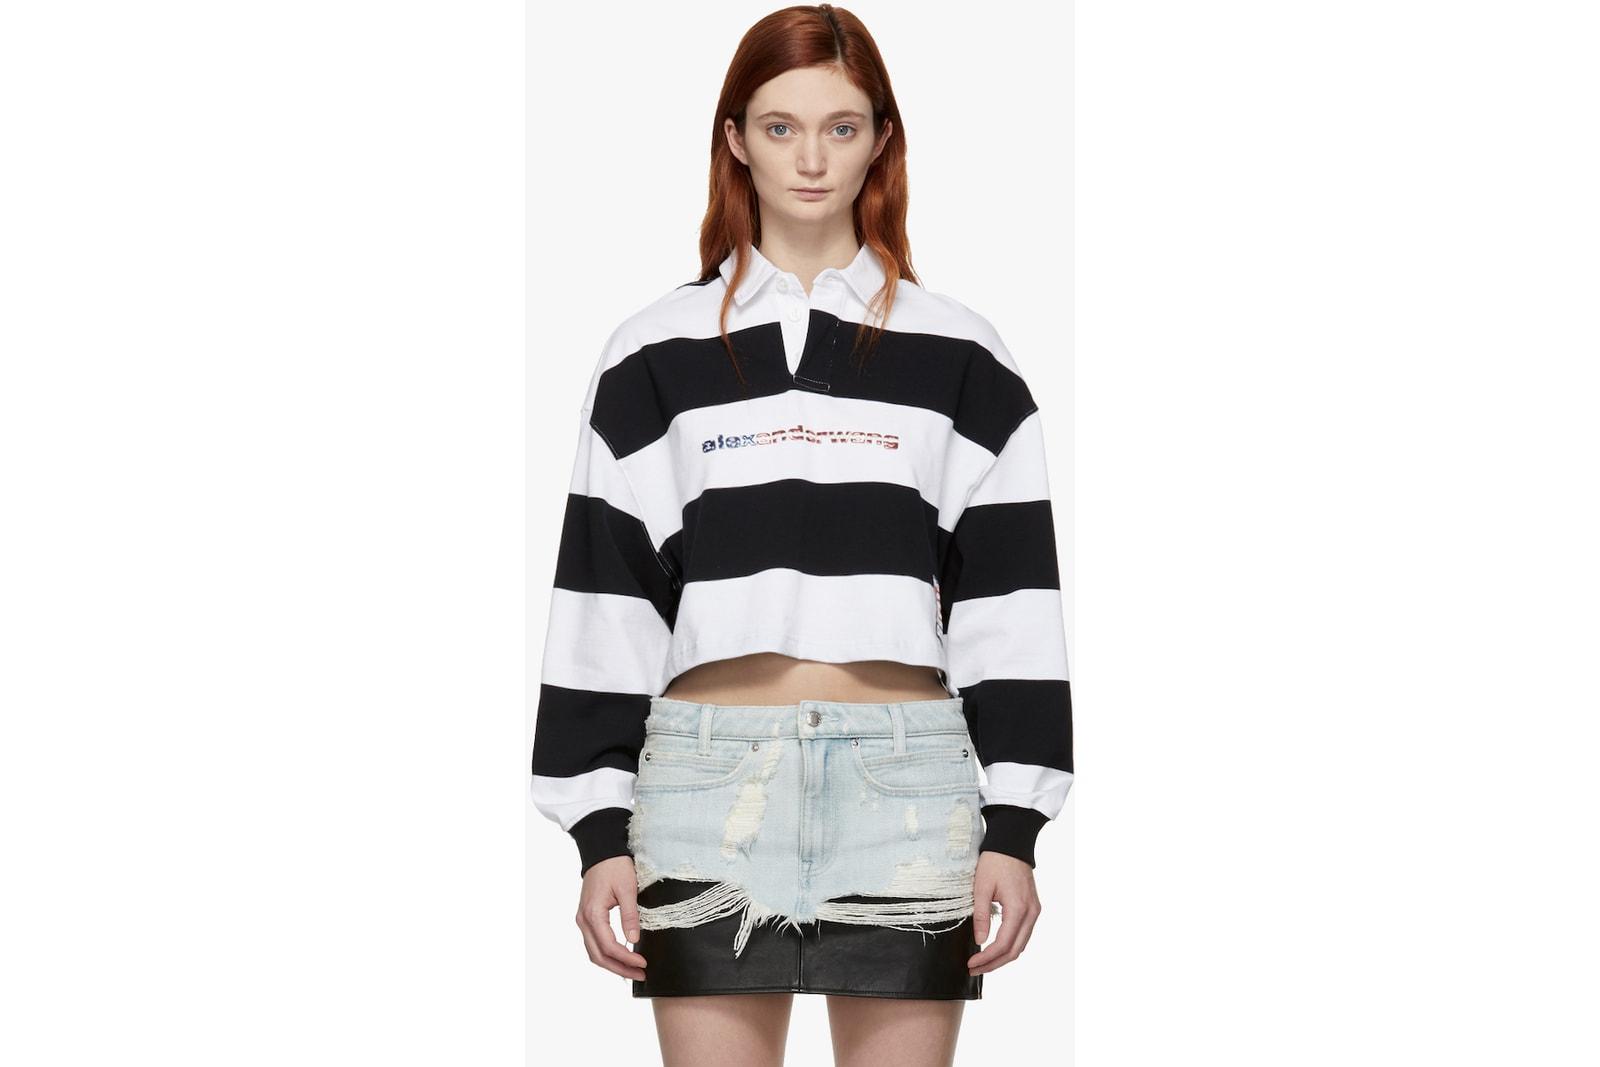 SSENSE Summer Sale Best Items Balenciaga AMBUSH Vetements Alexander Wang Alyx Air Max 180 Dr Martens